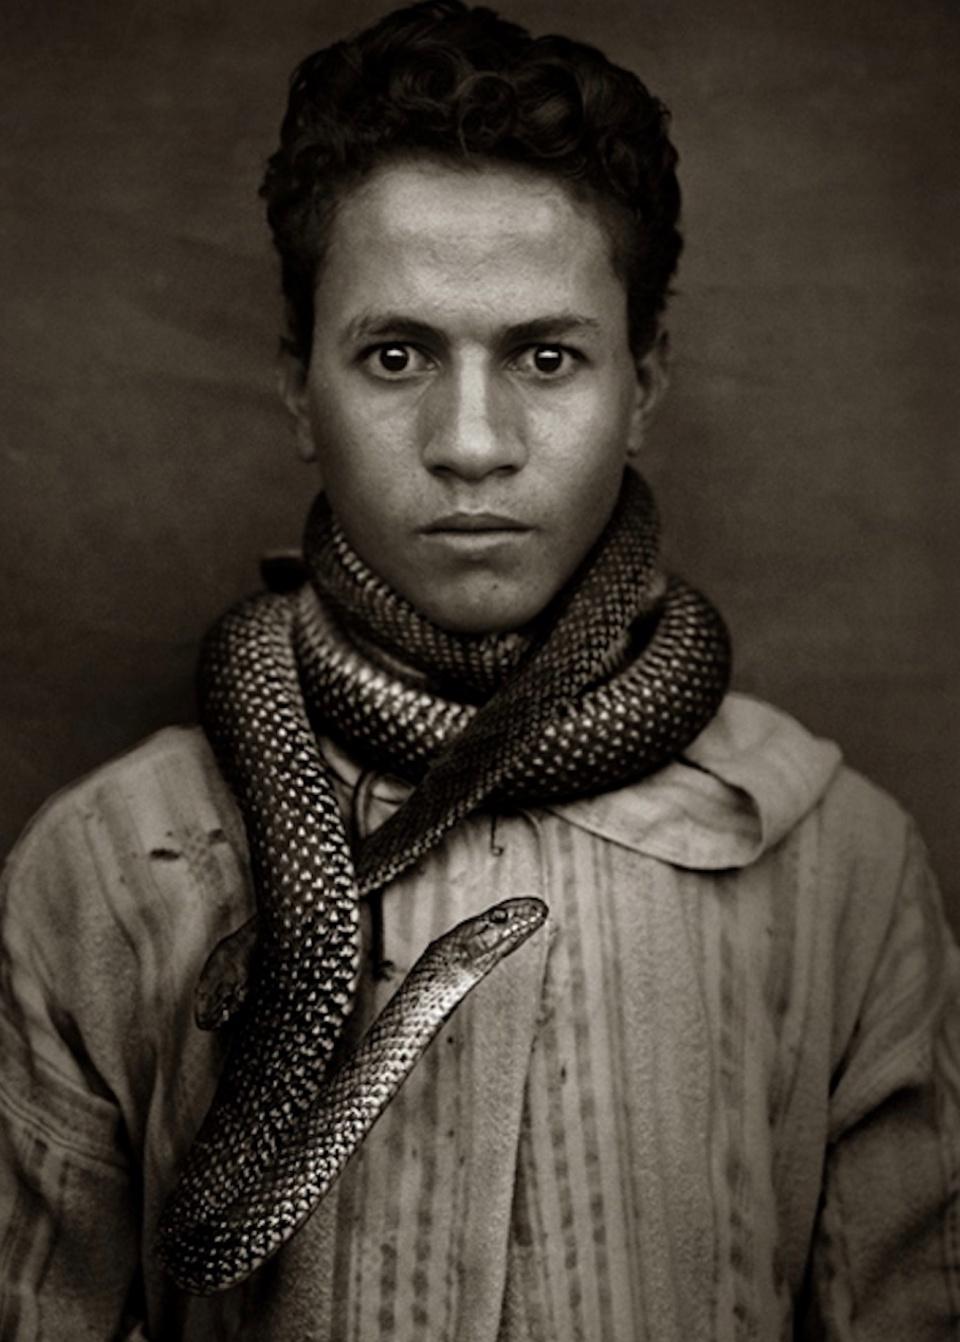 Albert Watson. Abas Chaeai, Snkae Chramer, Marrakesch, Marokko, 1997